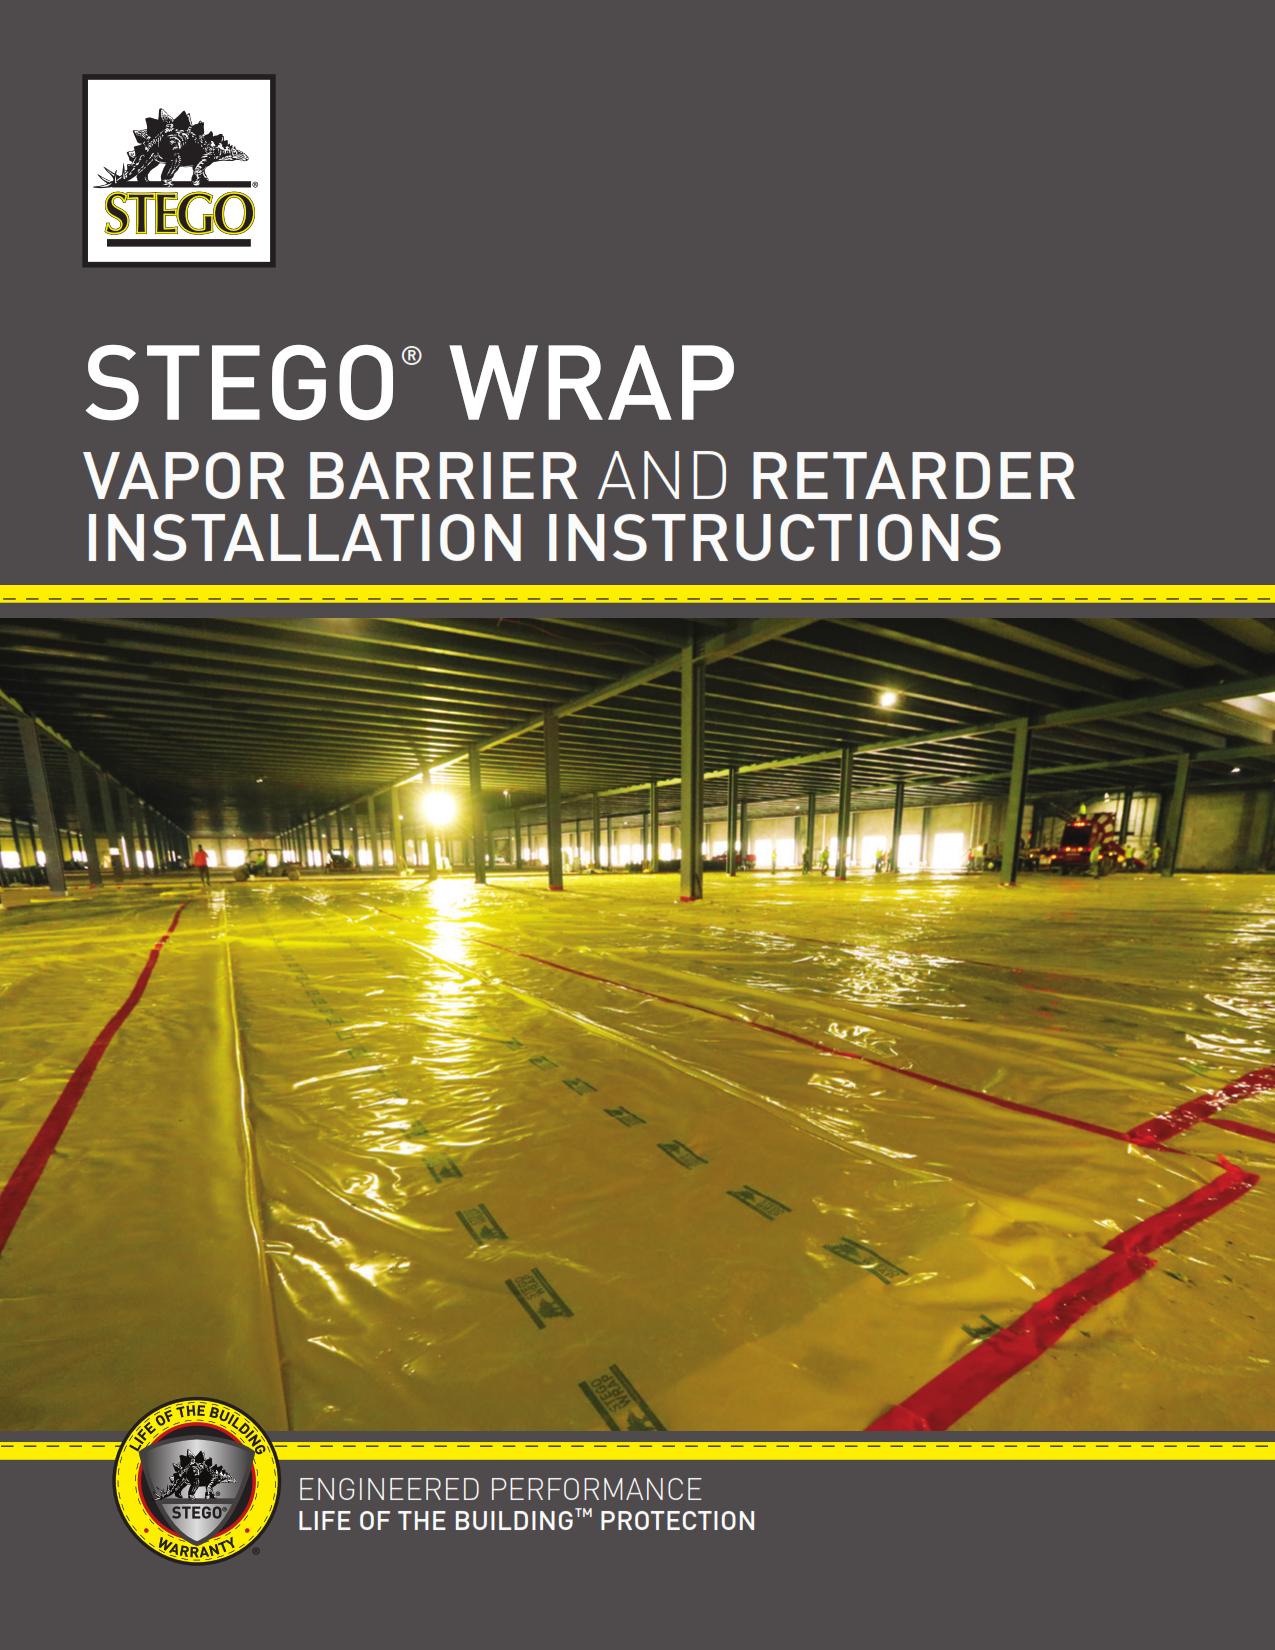 Stego-Wrap-Installation-Instructions-1